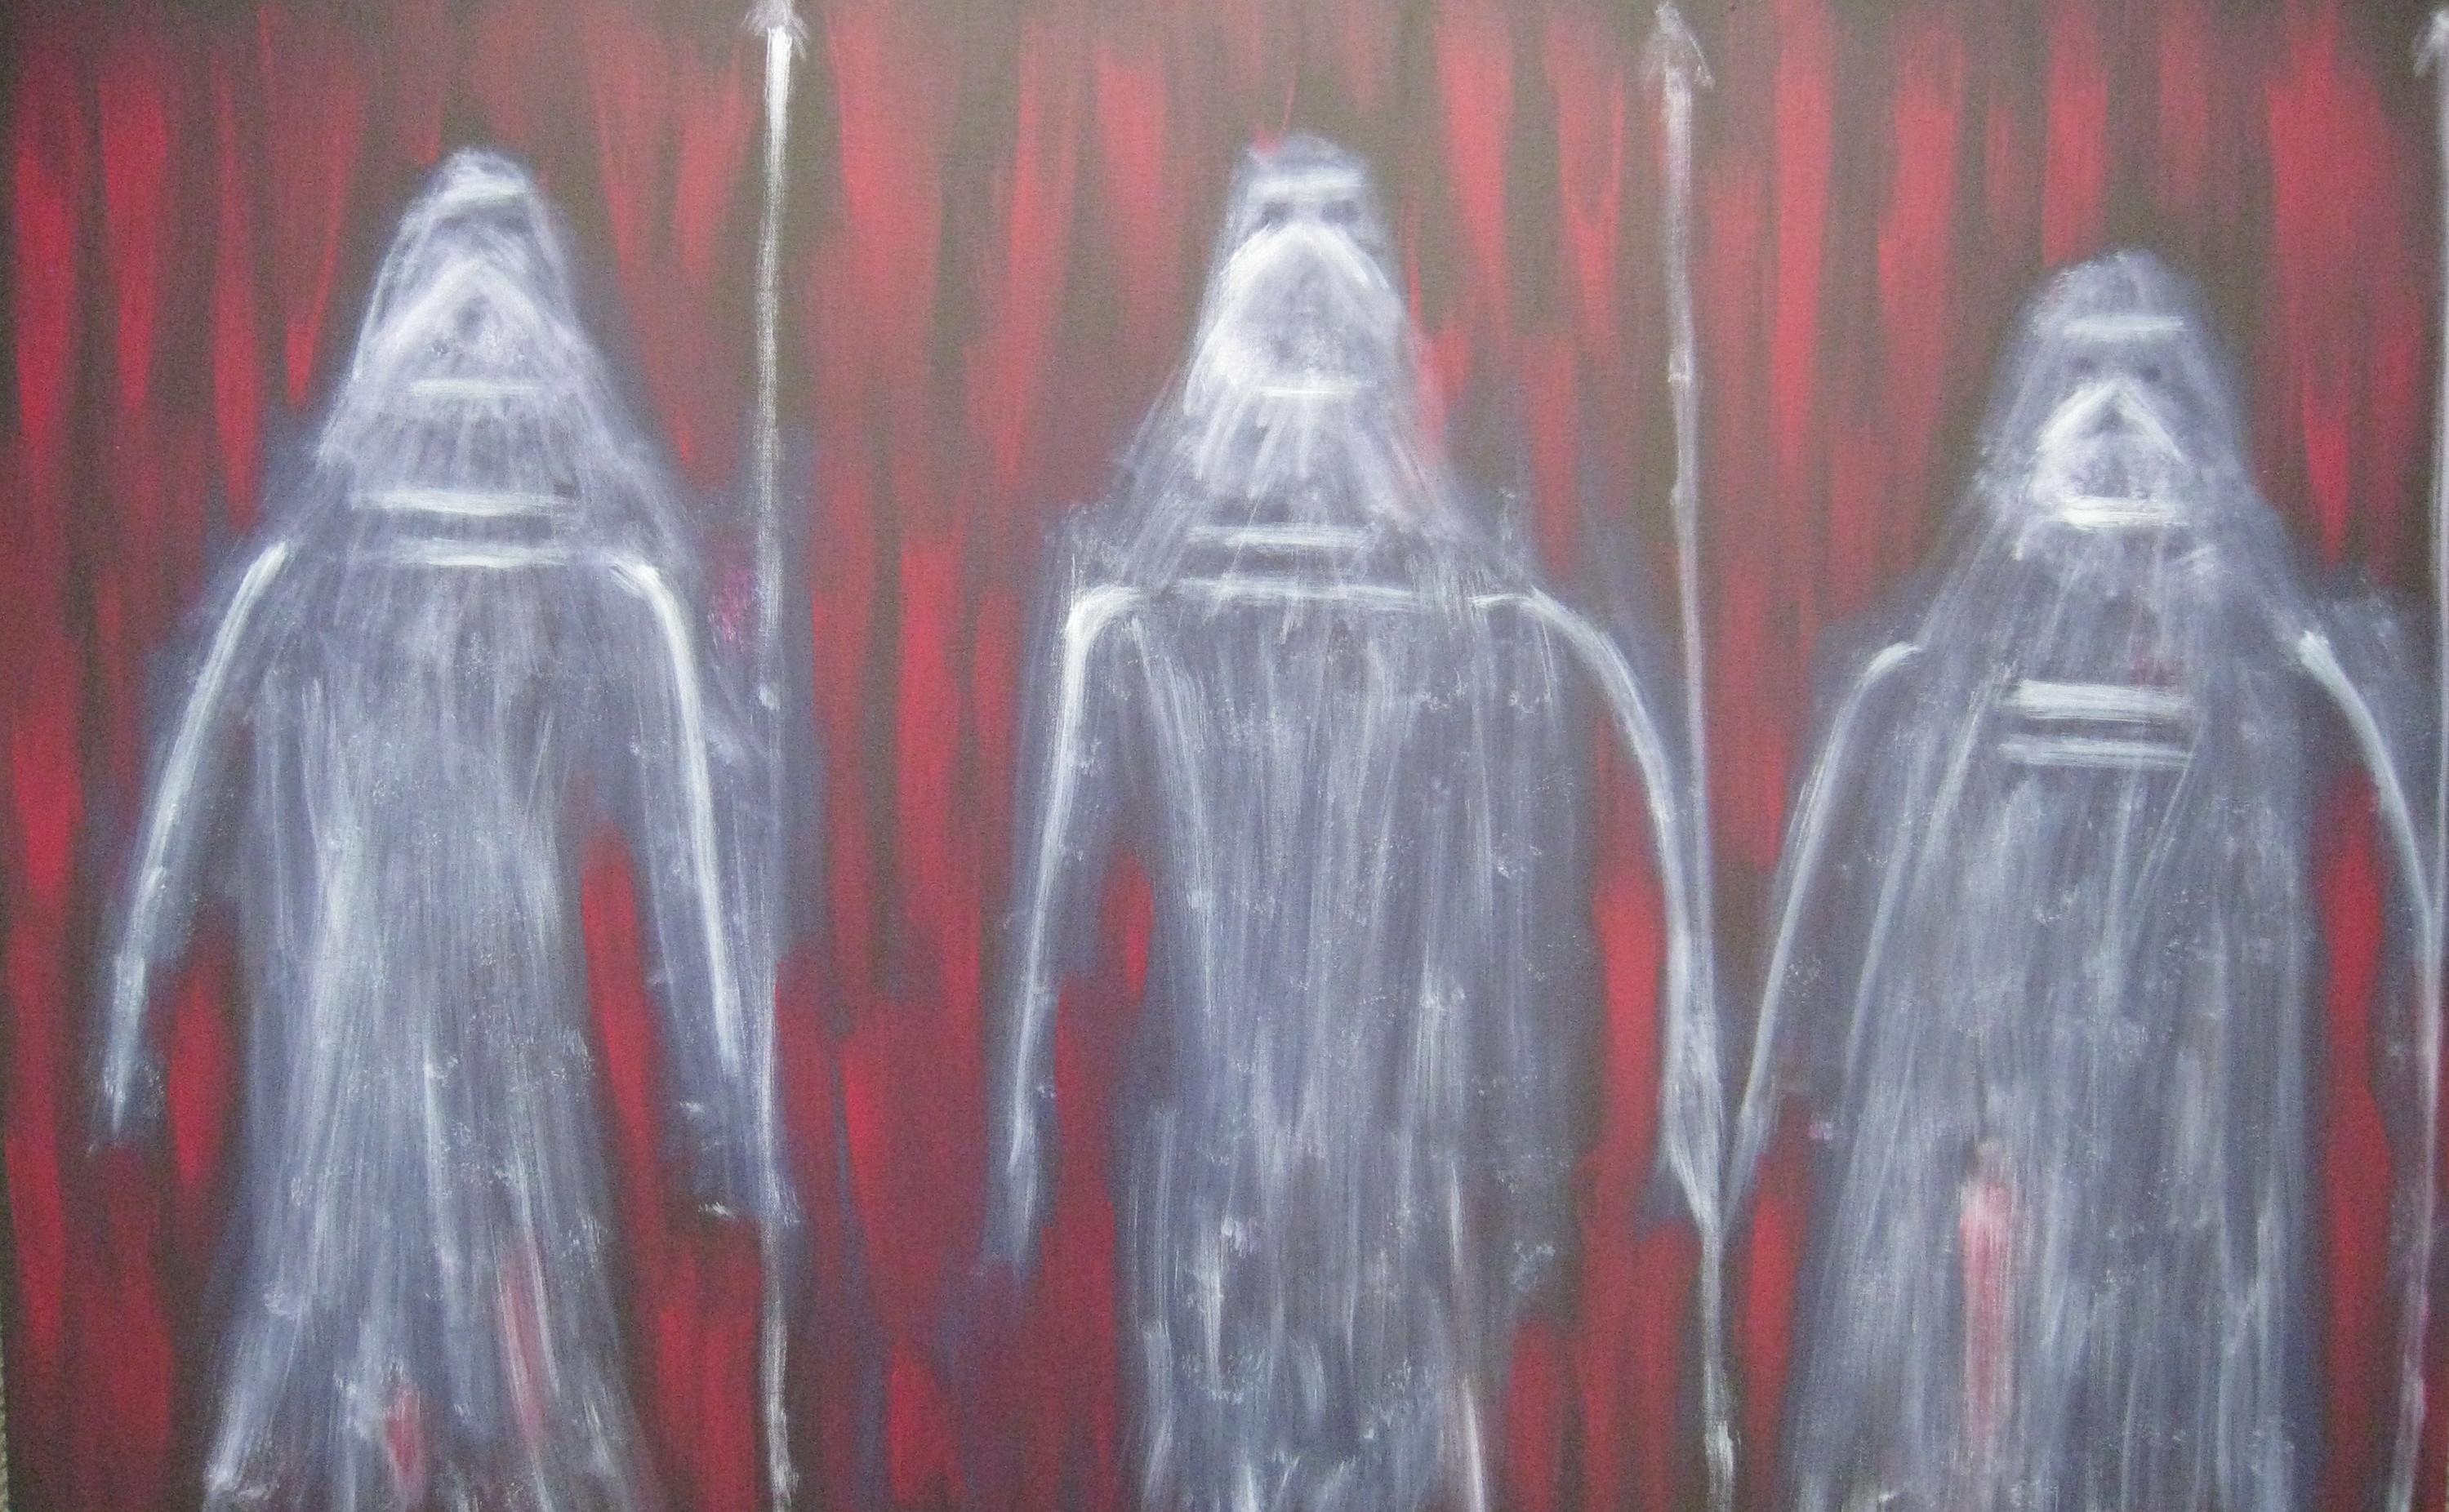 p25-graham-toomey-ghosts-of-resistance-warriors